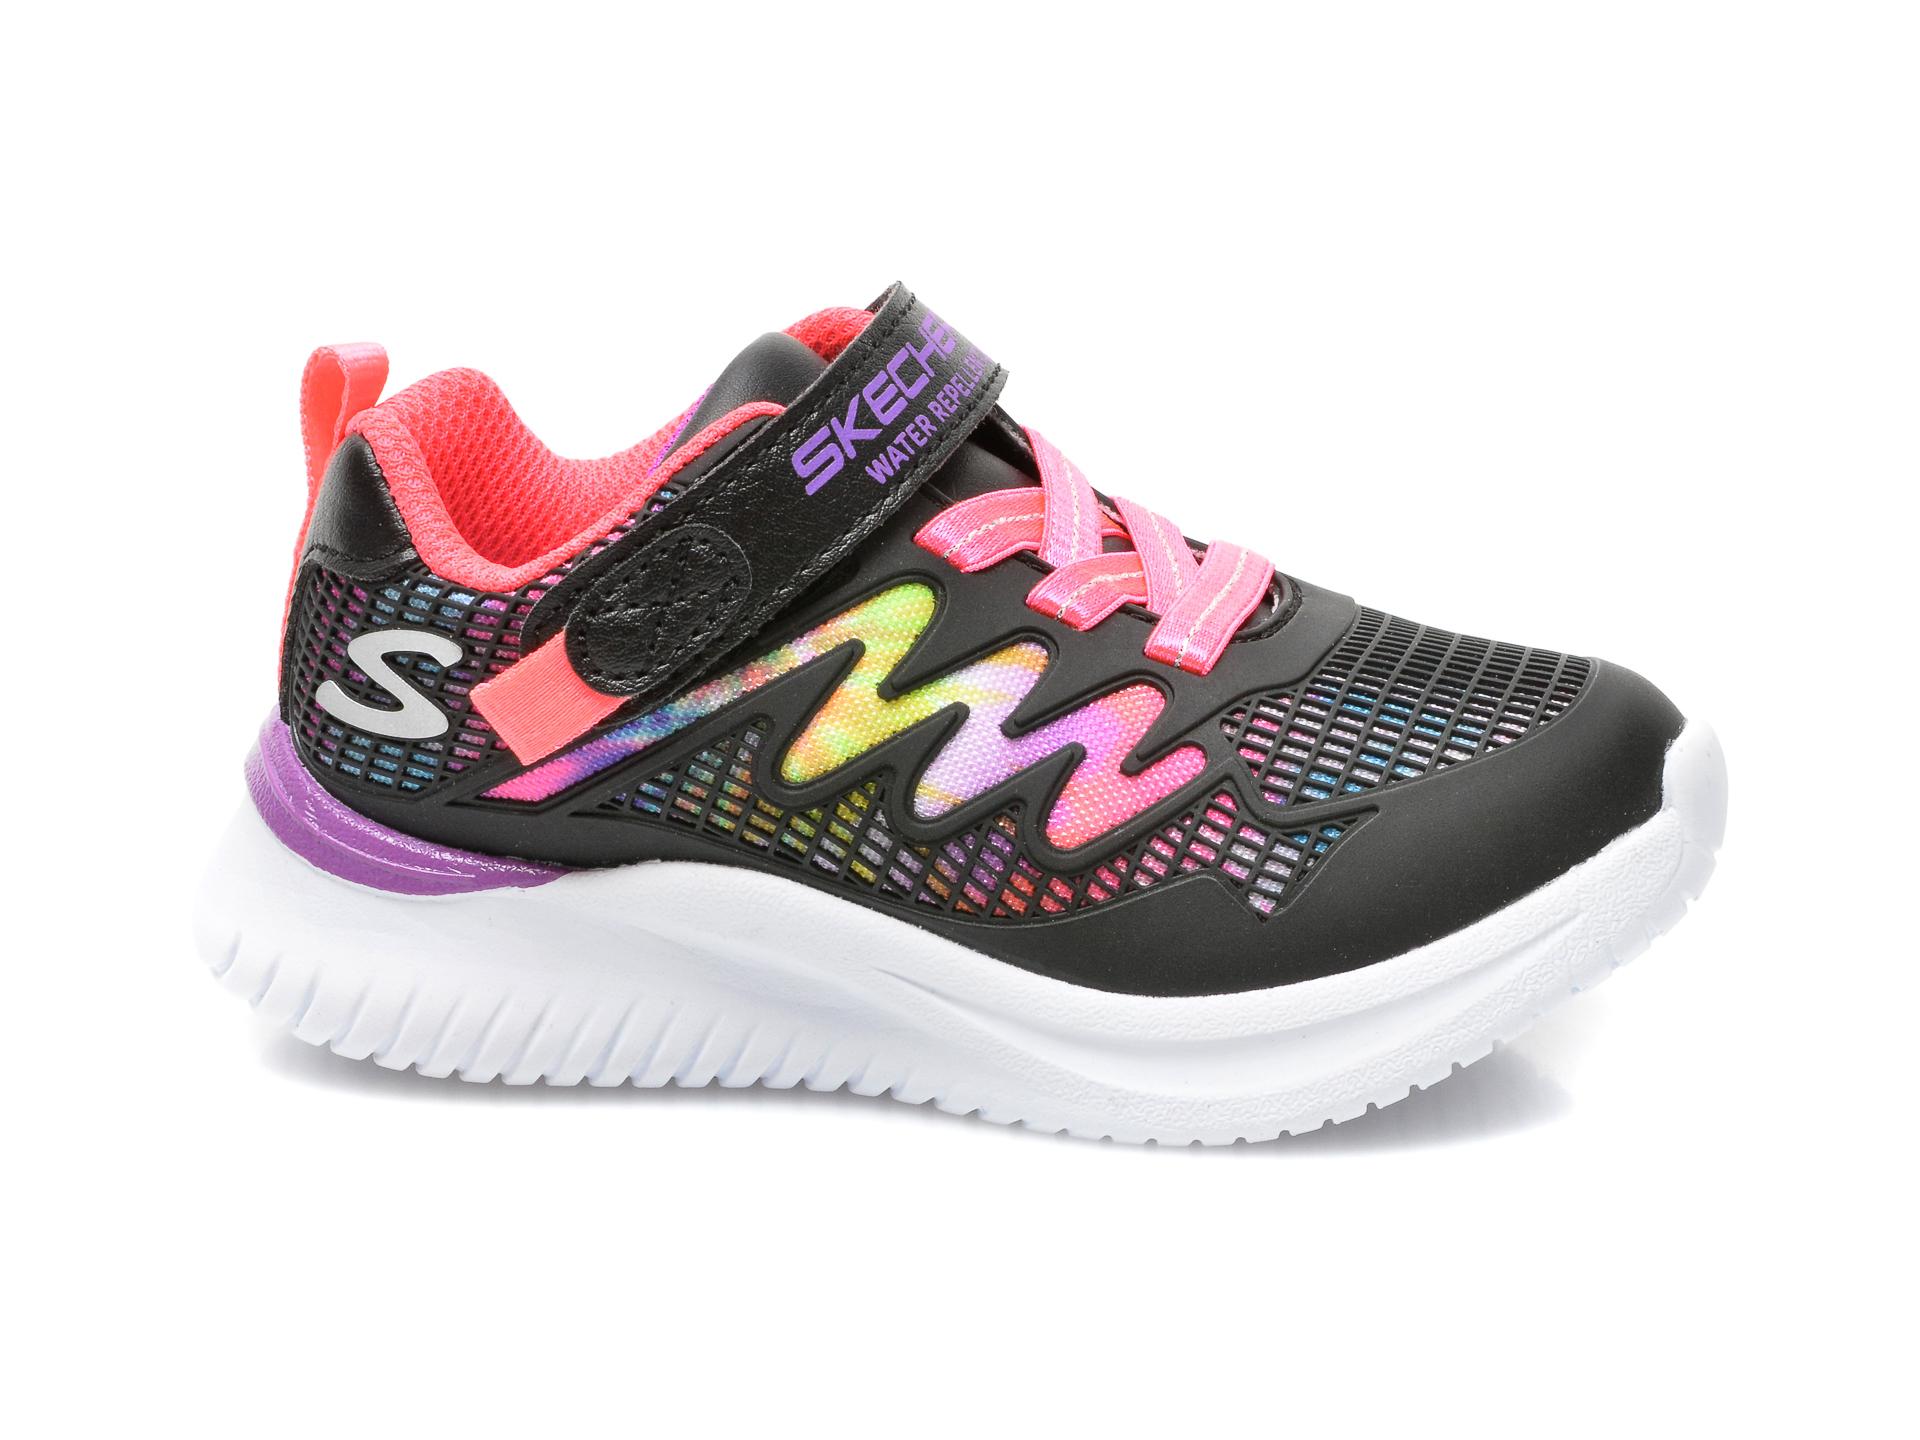 Pantofi sport SKECHERS negri, JUMPSTERS, din piele ecologica - 1